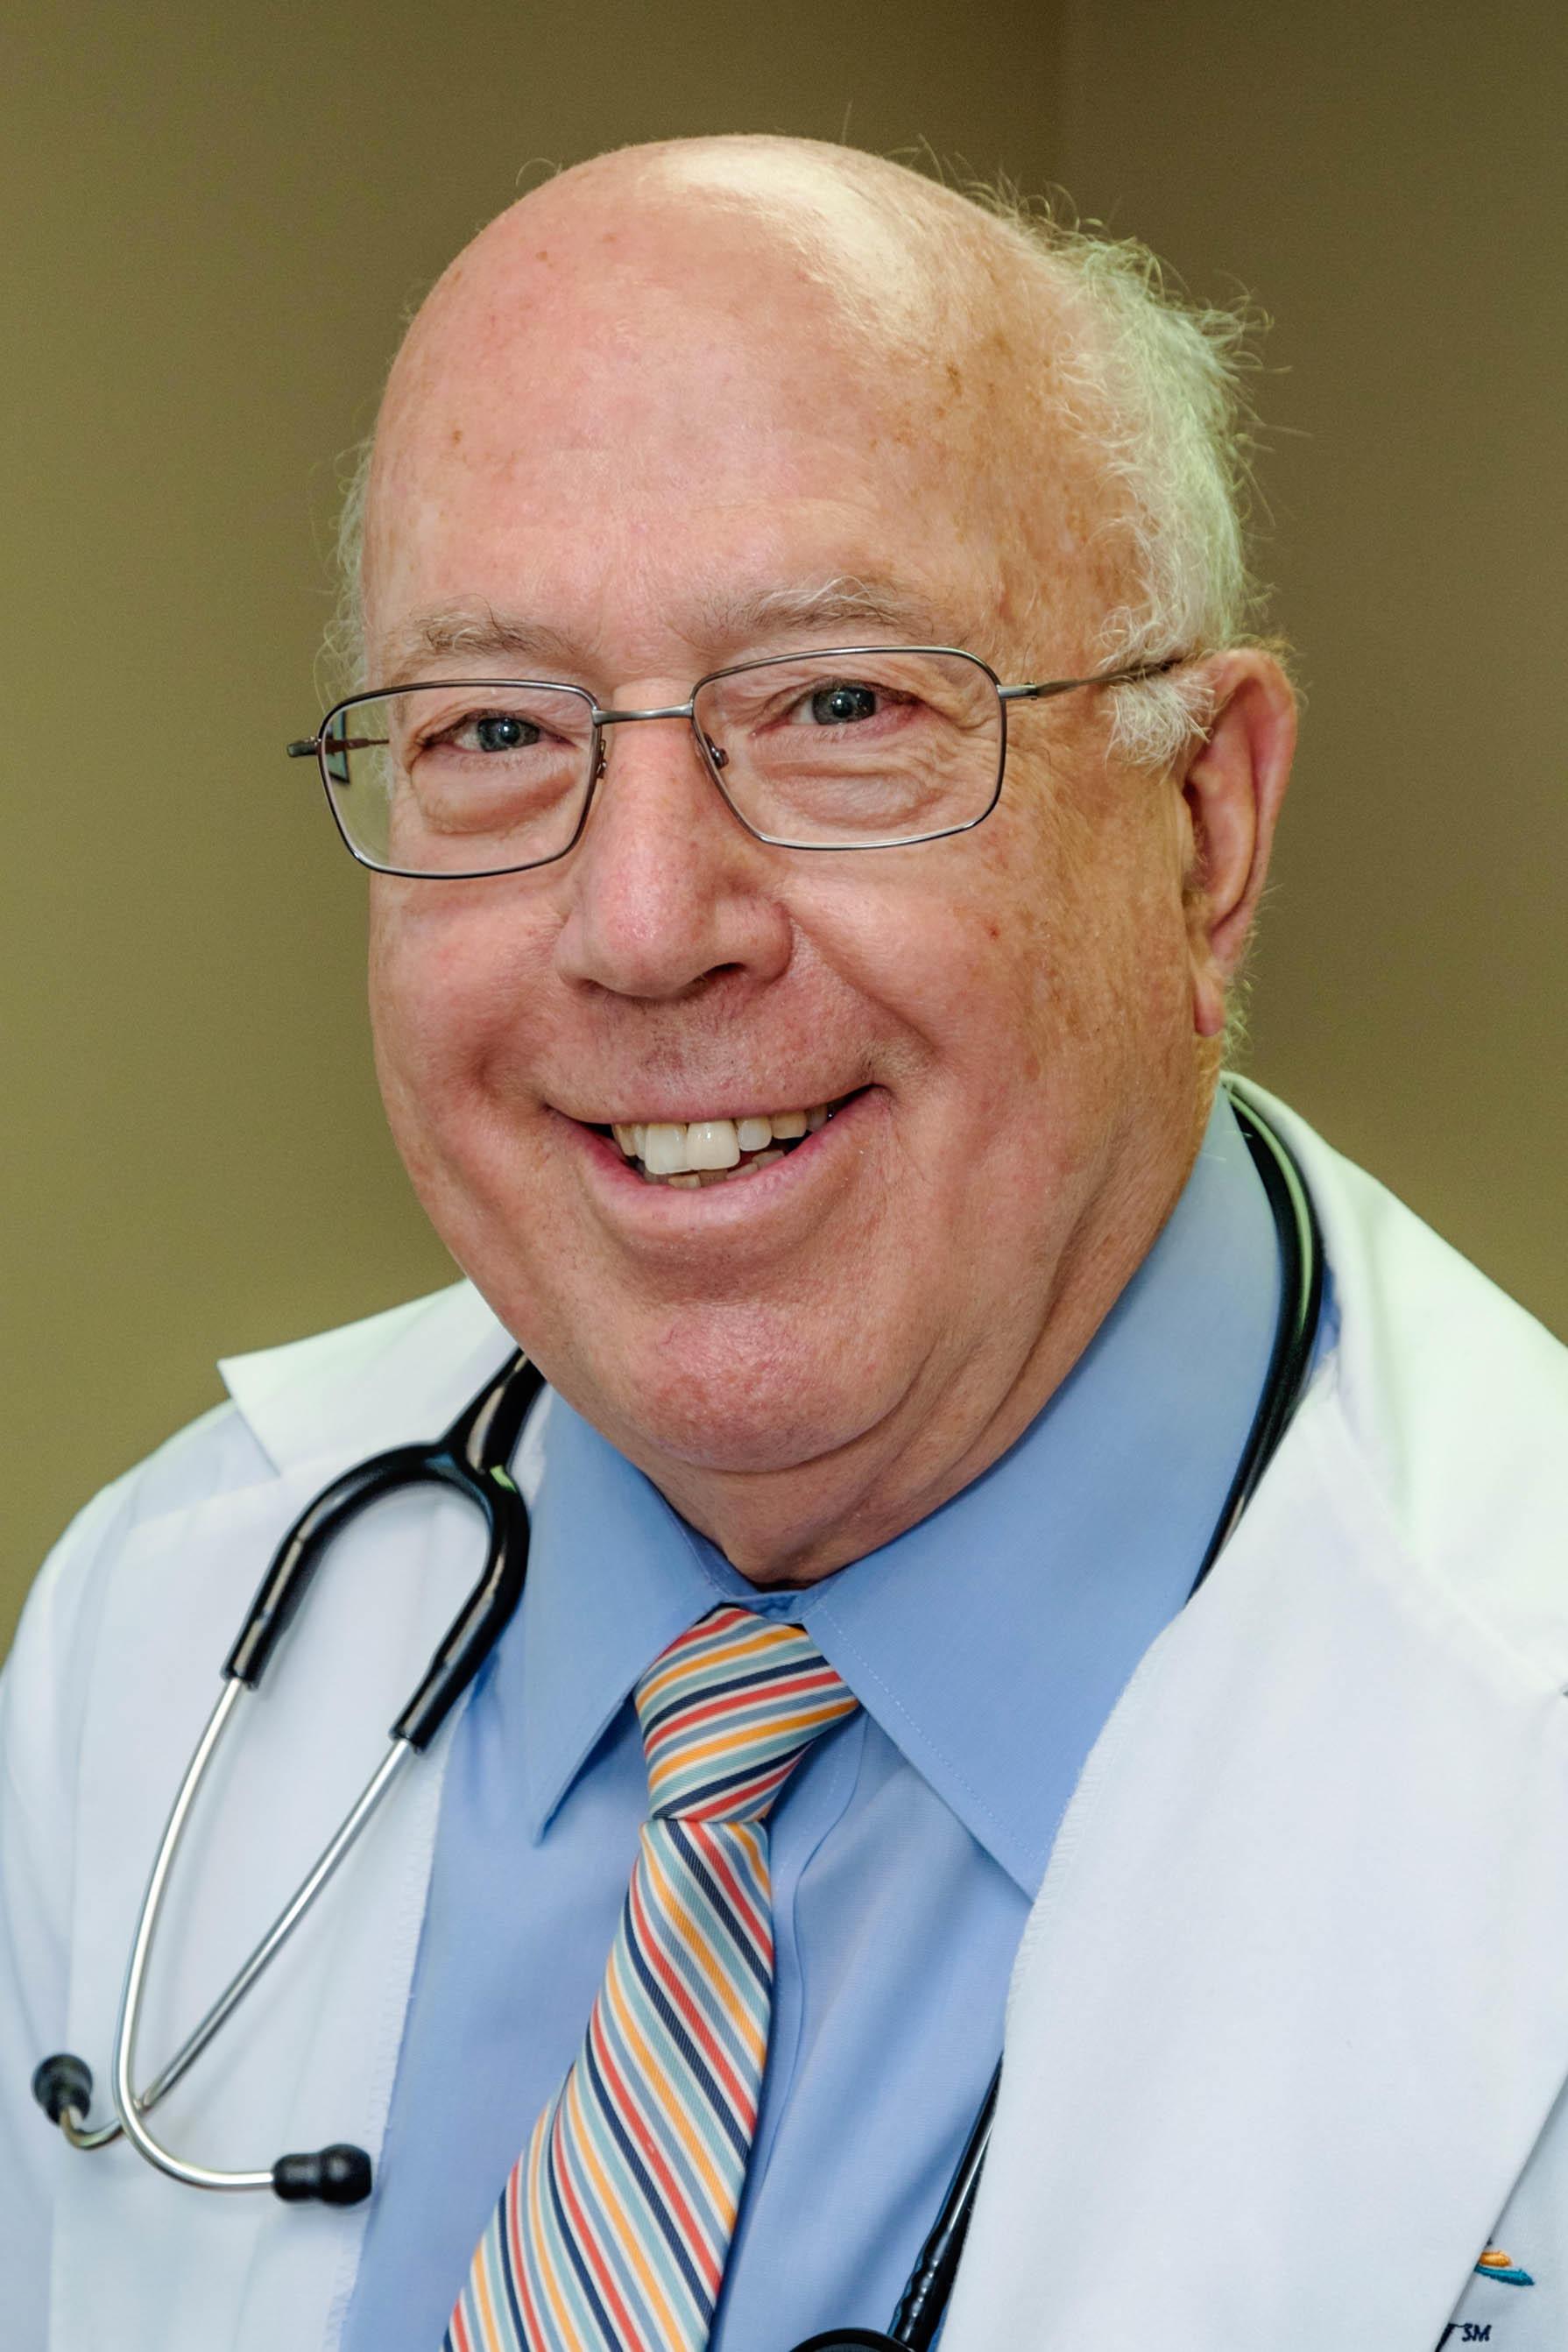 Edward Koch, MD PC